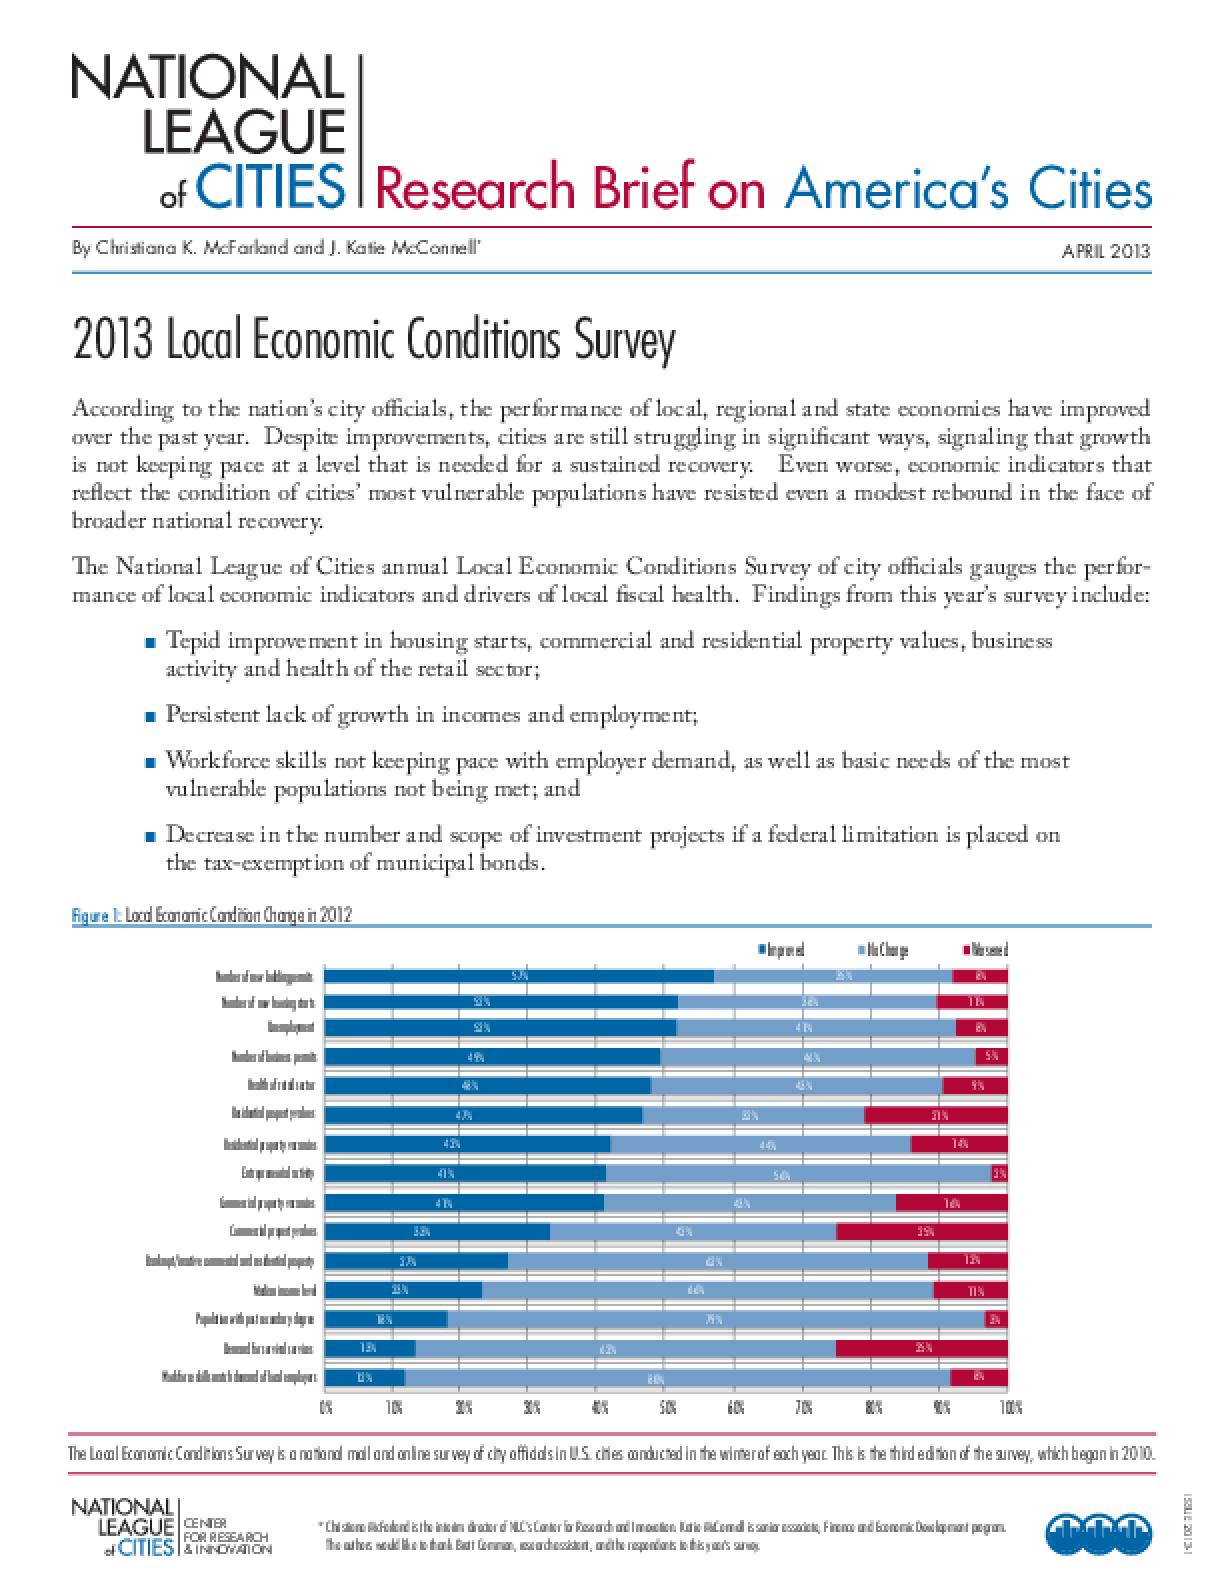 2013 Local Economic Conditions Survey